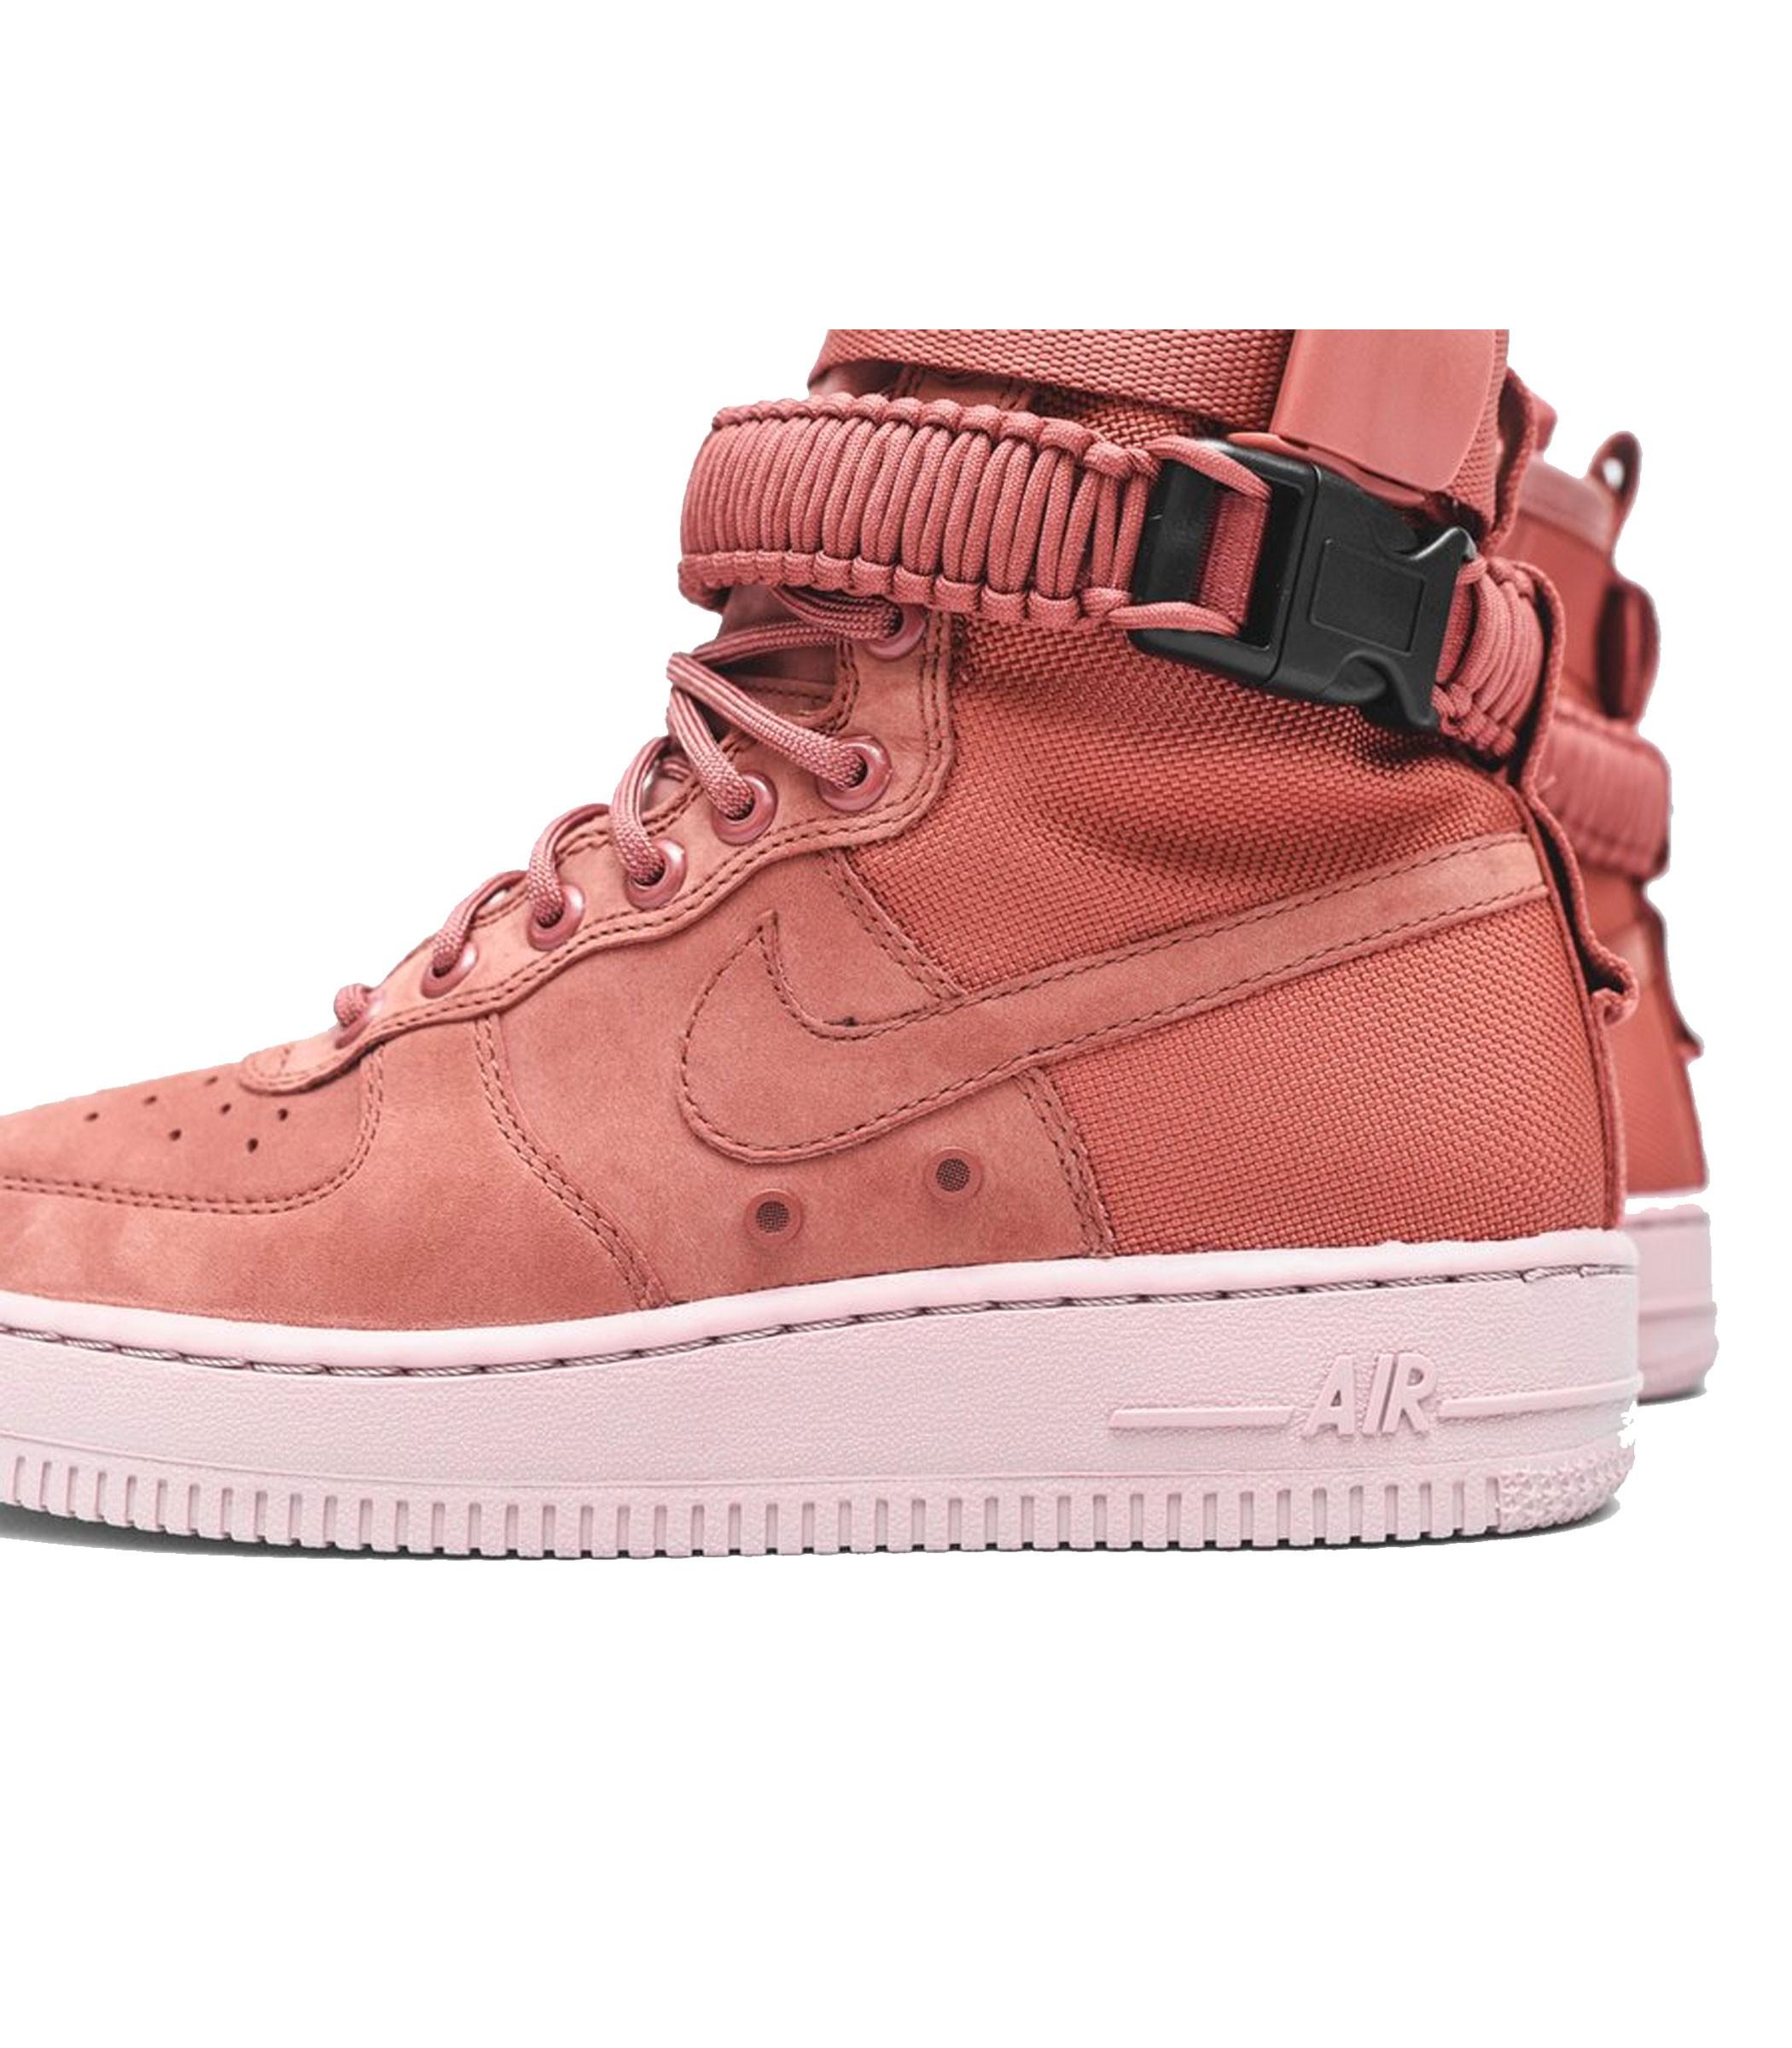 fa95cf4f4563 ... Scarpe Nike SF Air Force 1 Dusty Peach ...